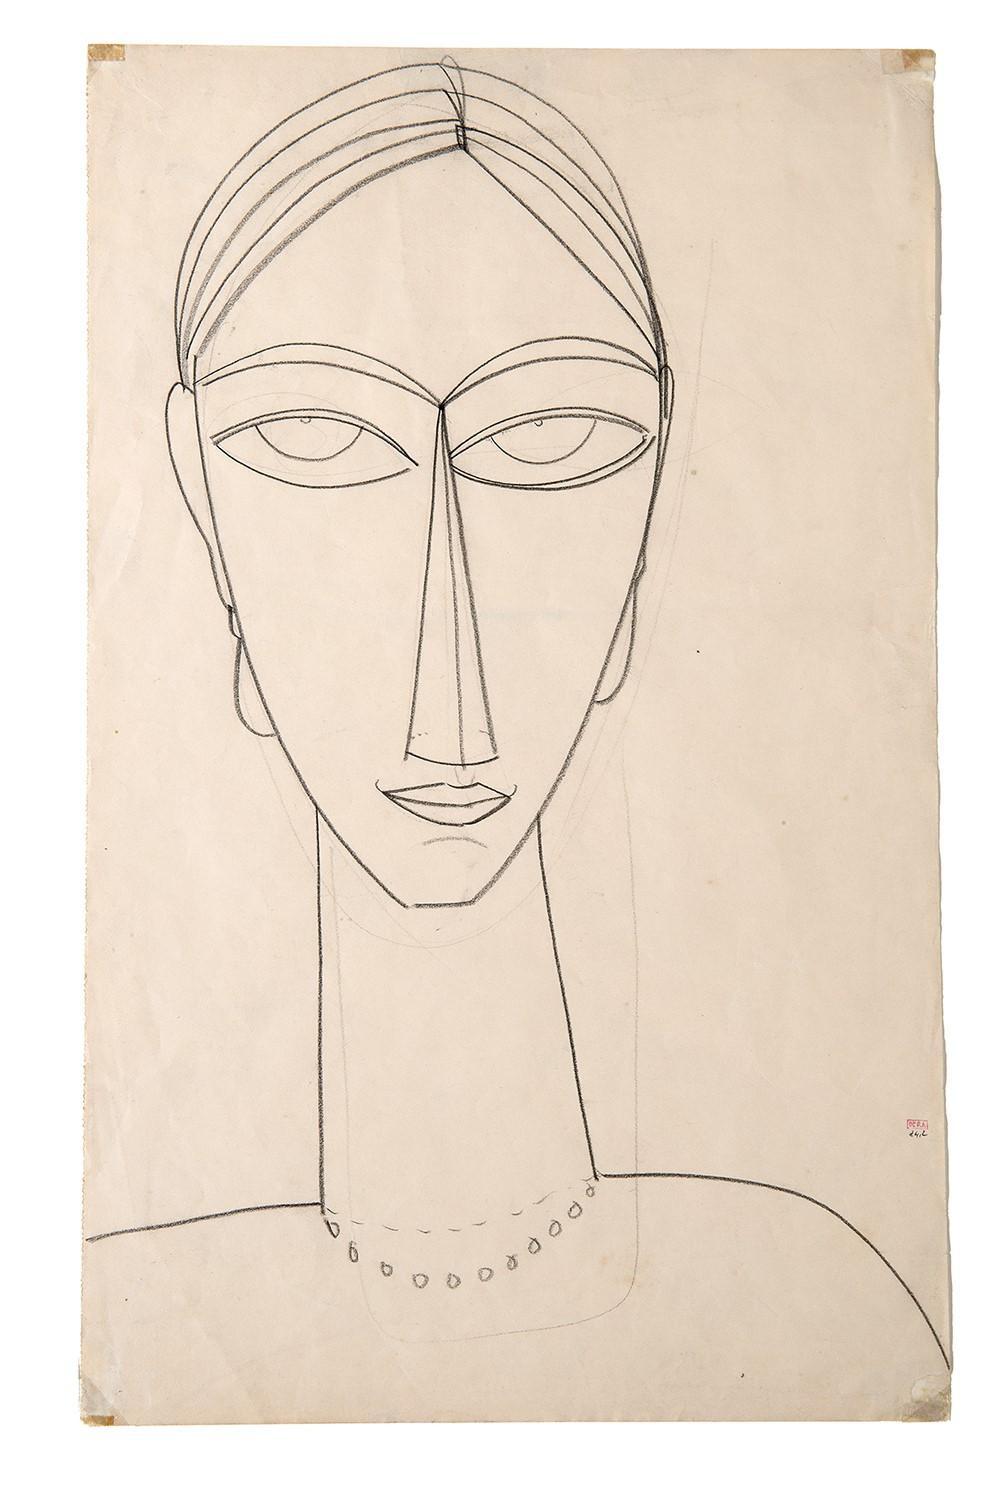 Amedeo Modigliani, Testa, Foto © FAI